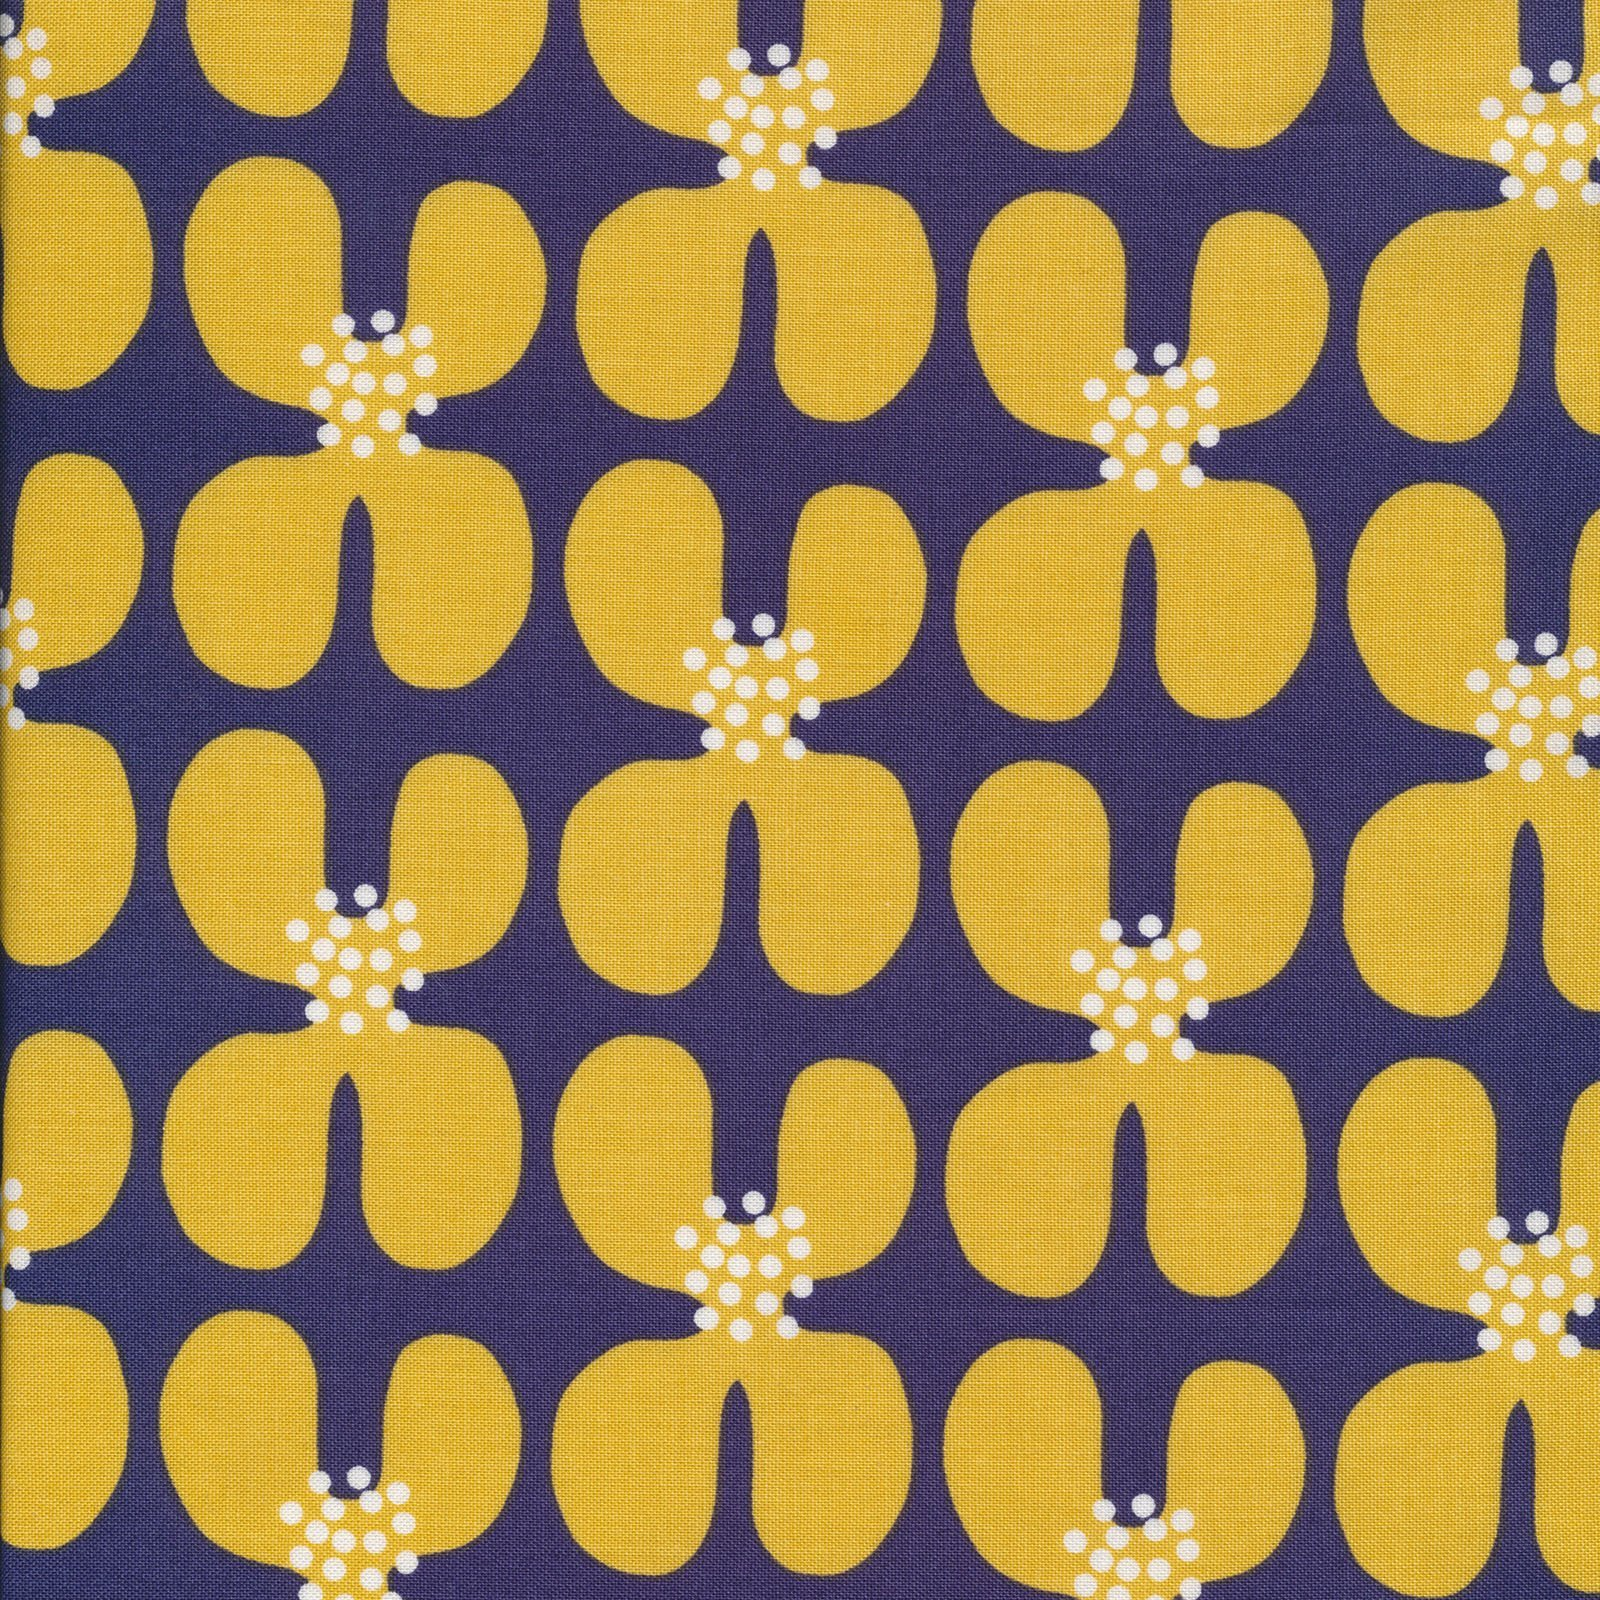 Cloud9 - Laminate (Golden Poppy)